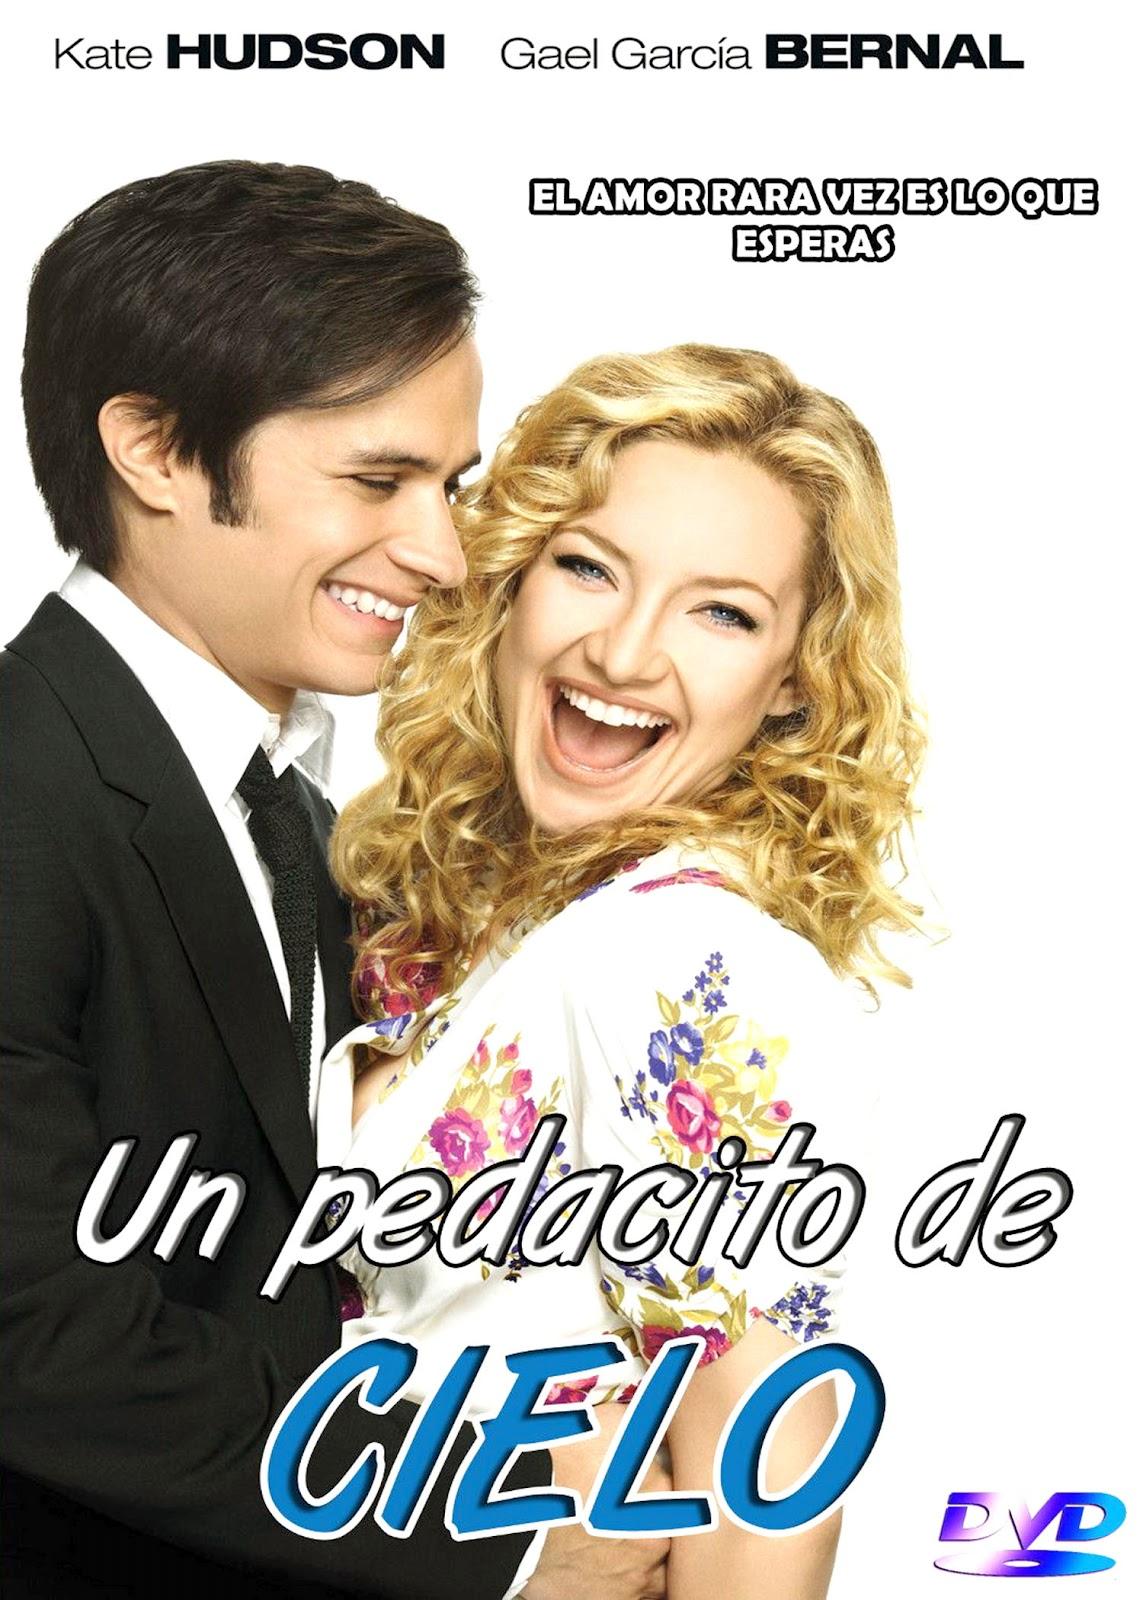 A Little Bit of Heaven (Un pedacito de cielo) (2011)